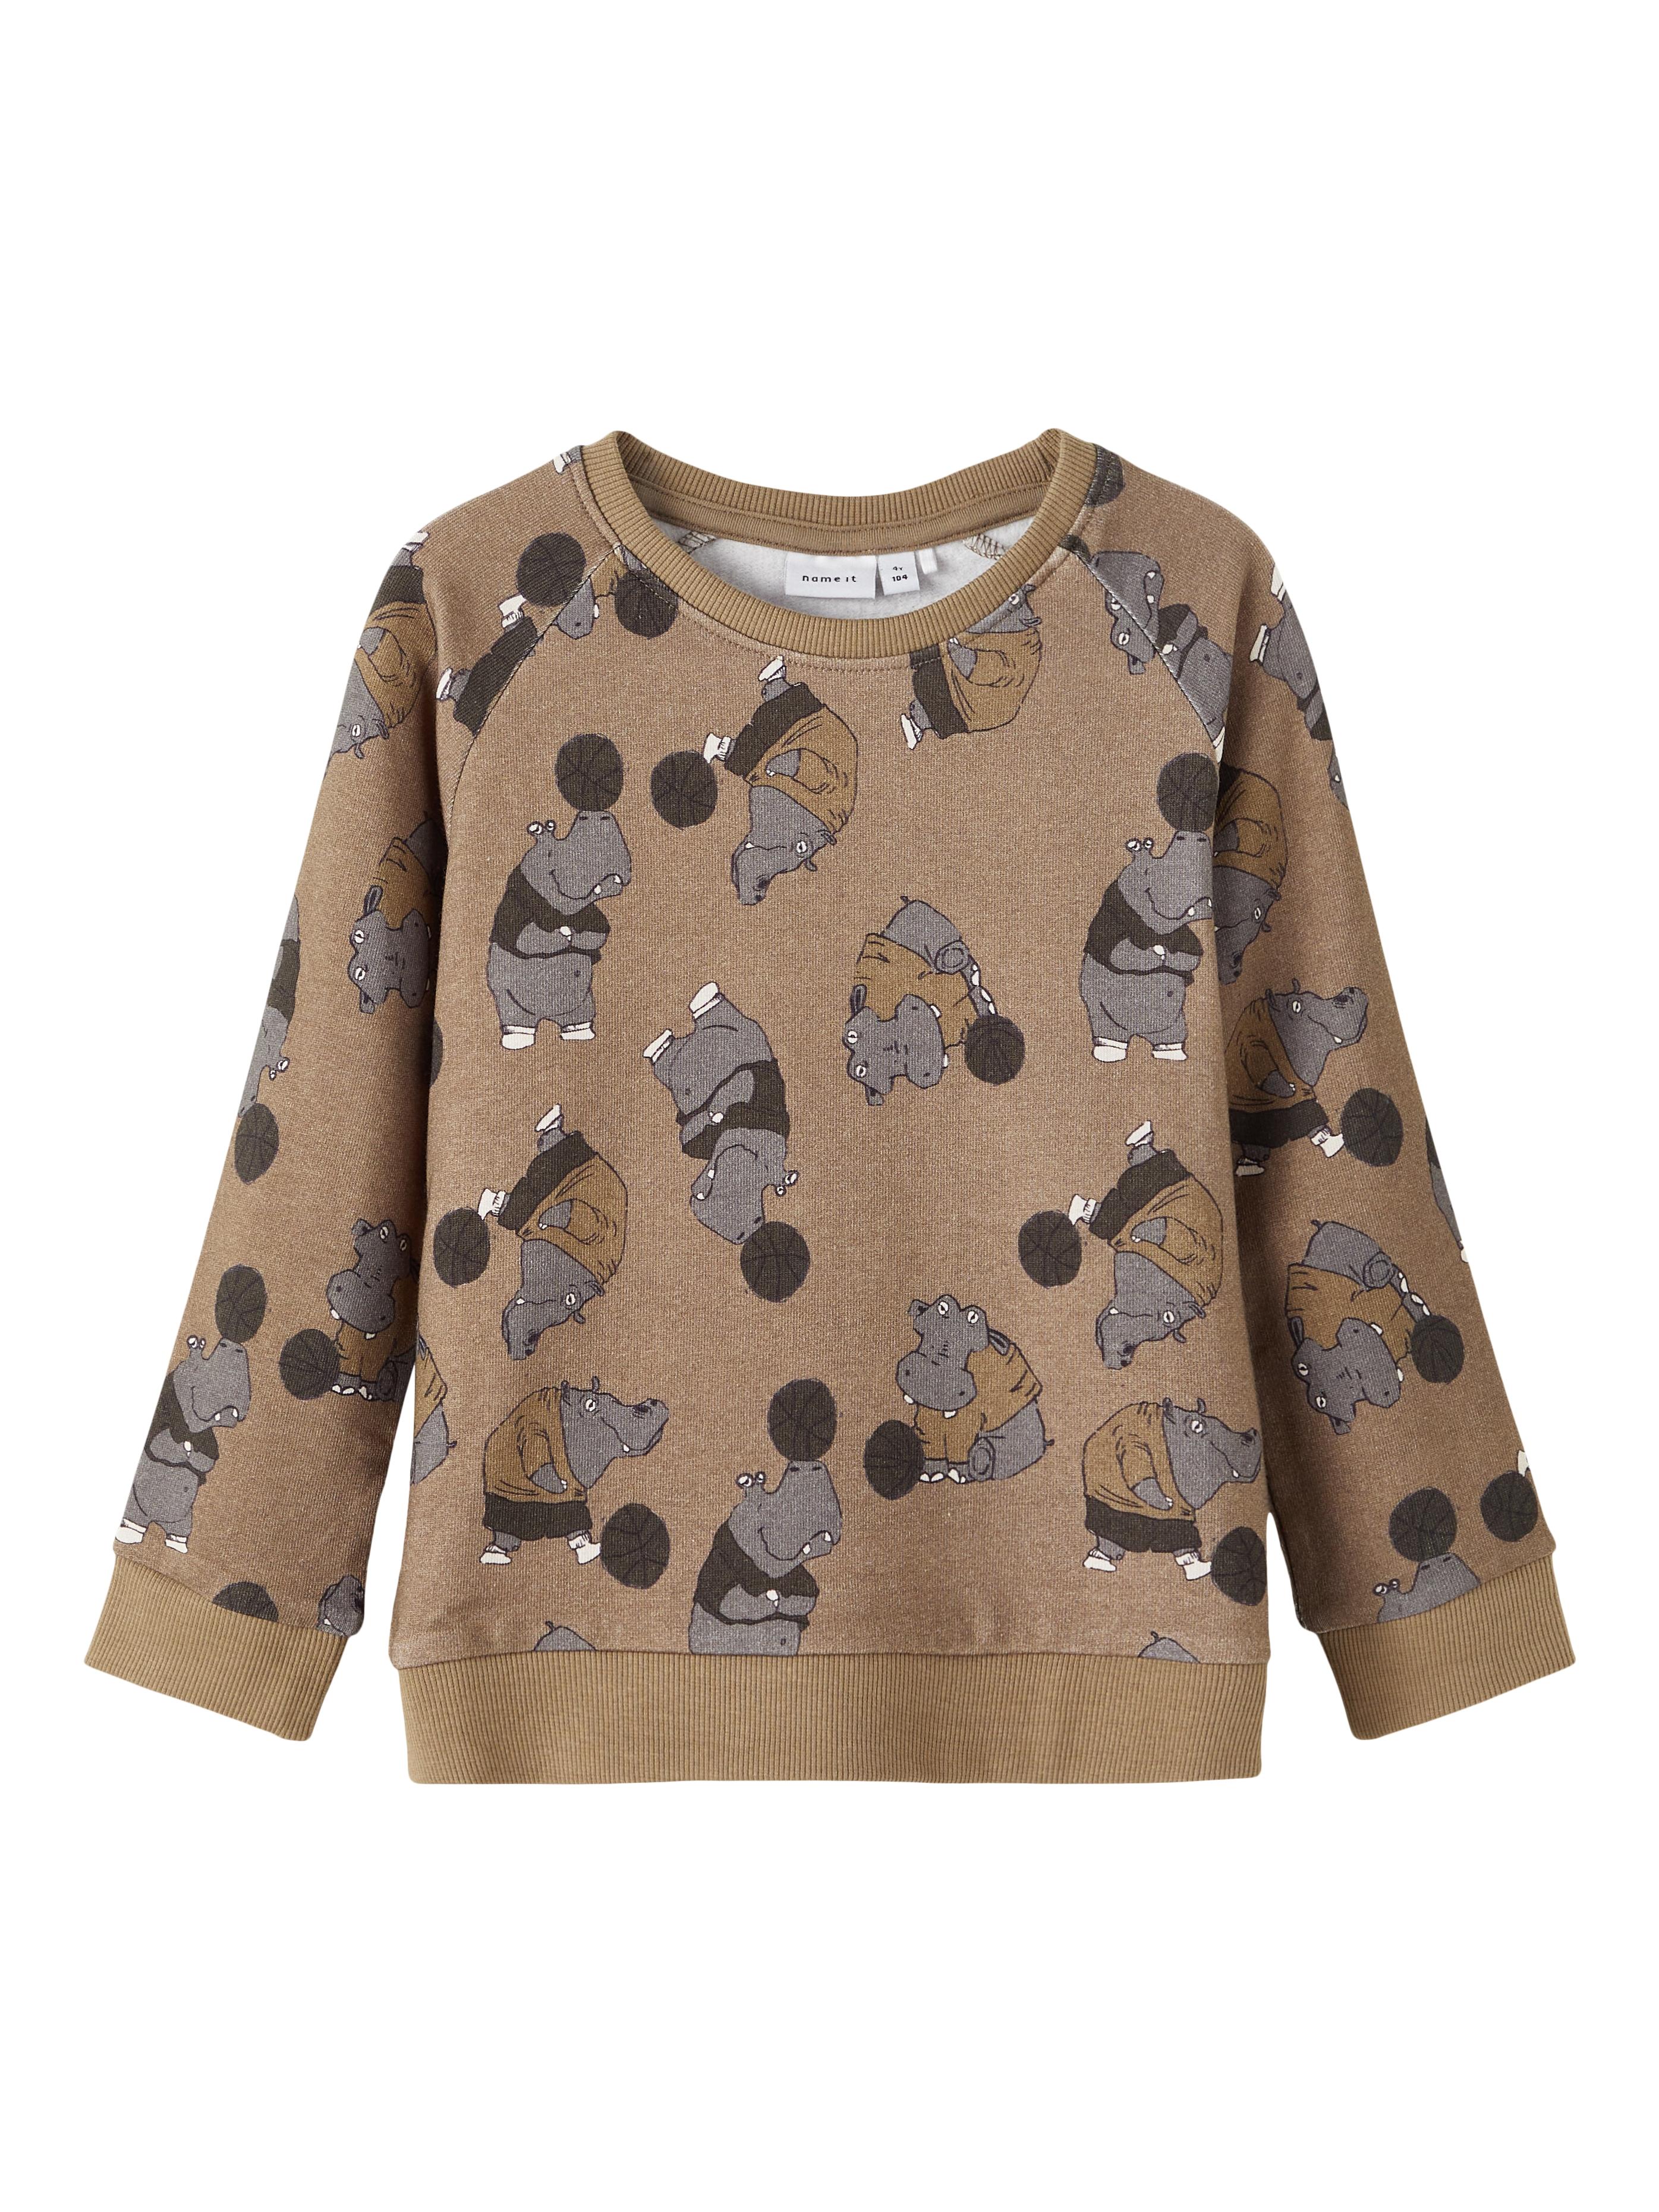 Name It Sonny sweatshirt, stone gray, 92 cm